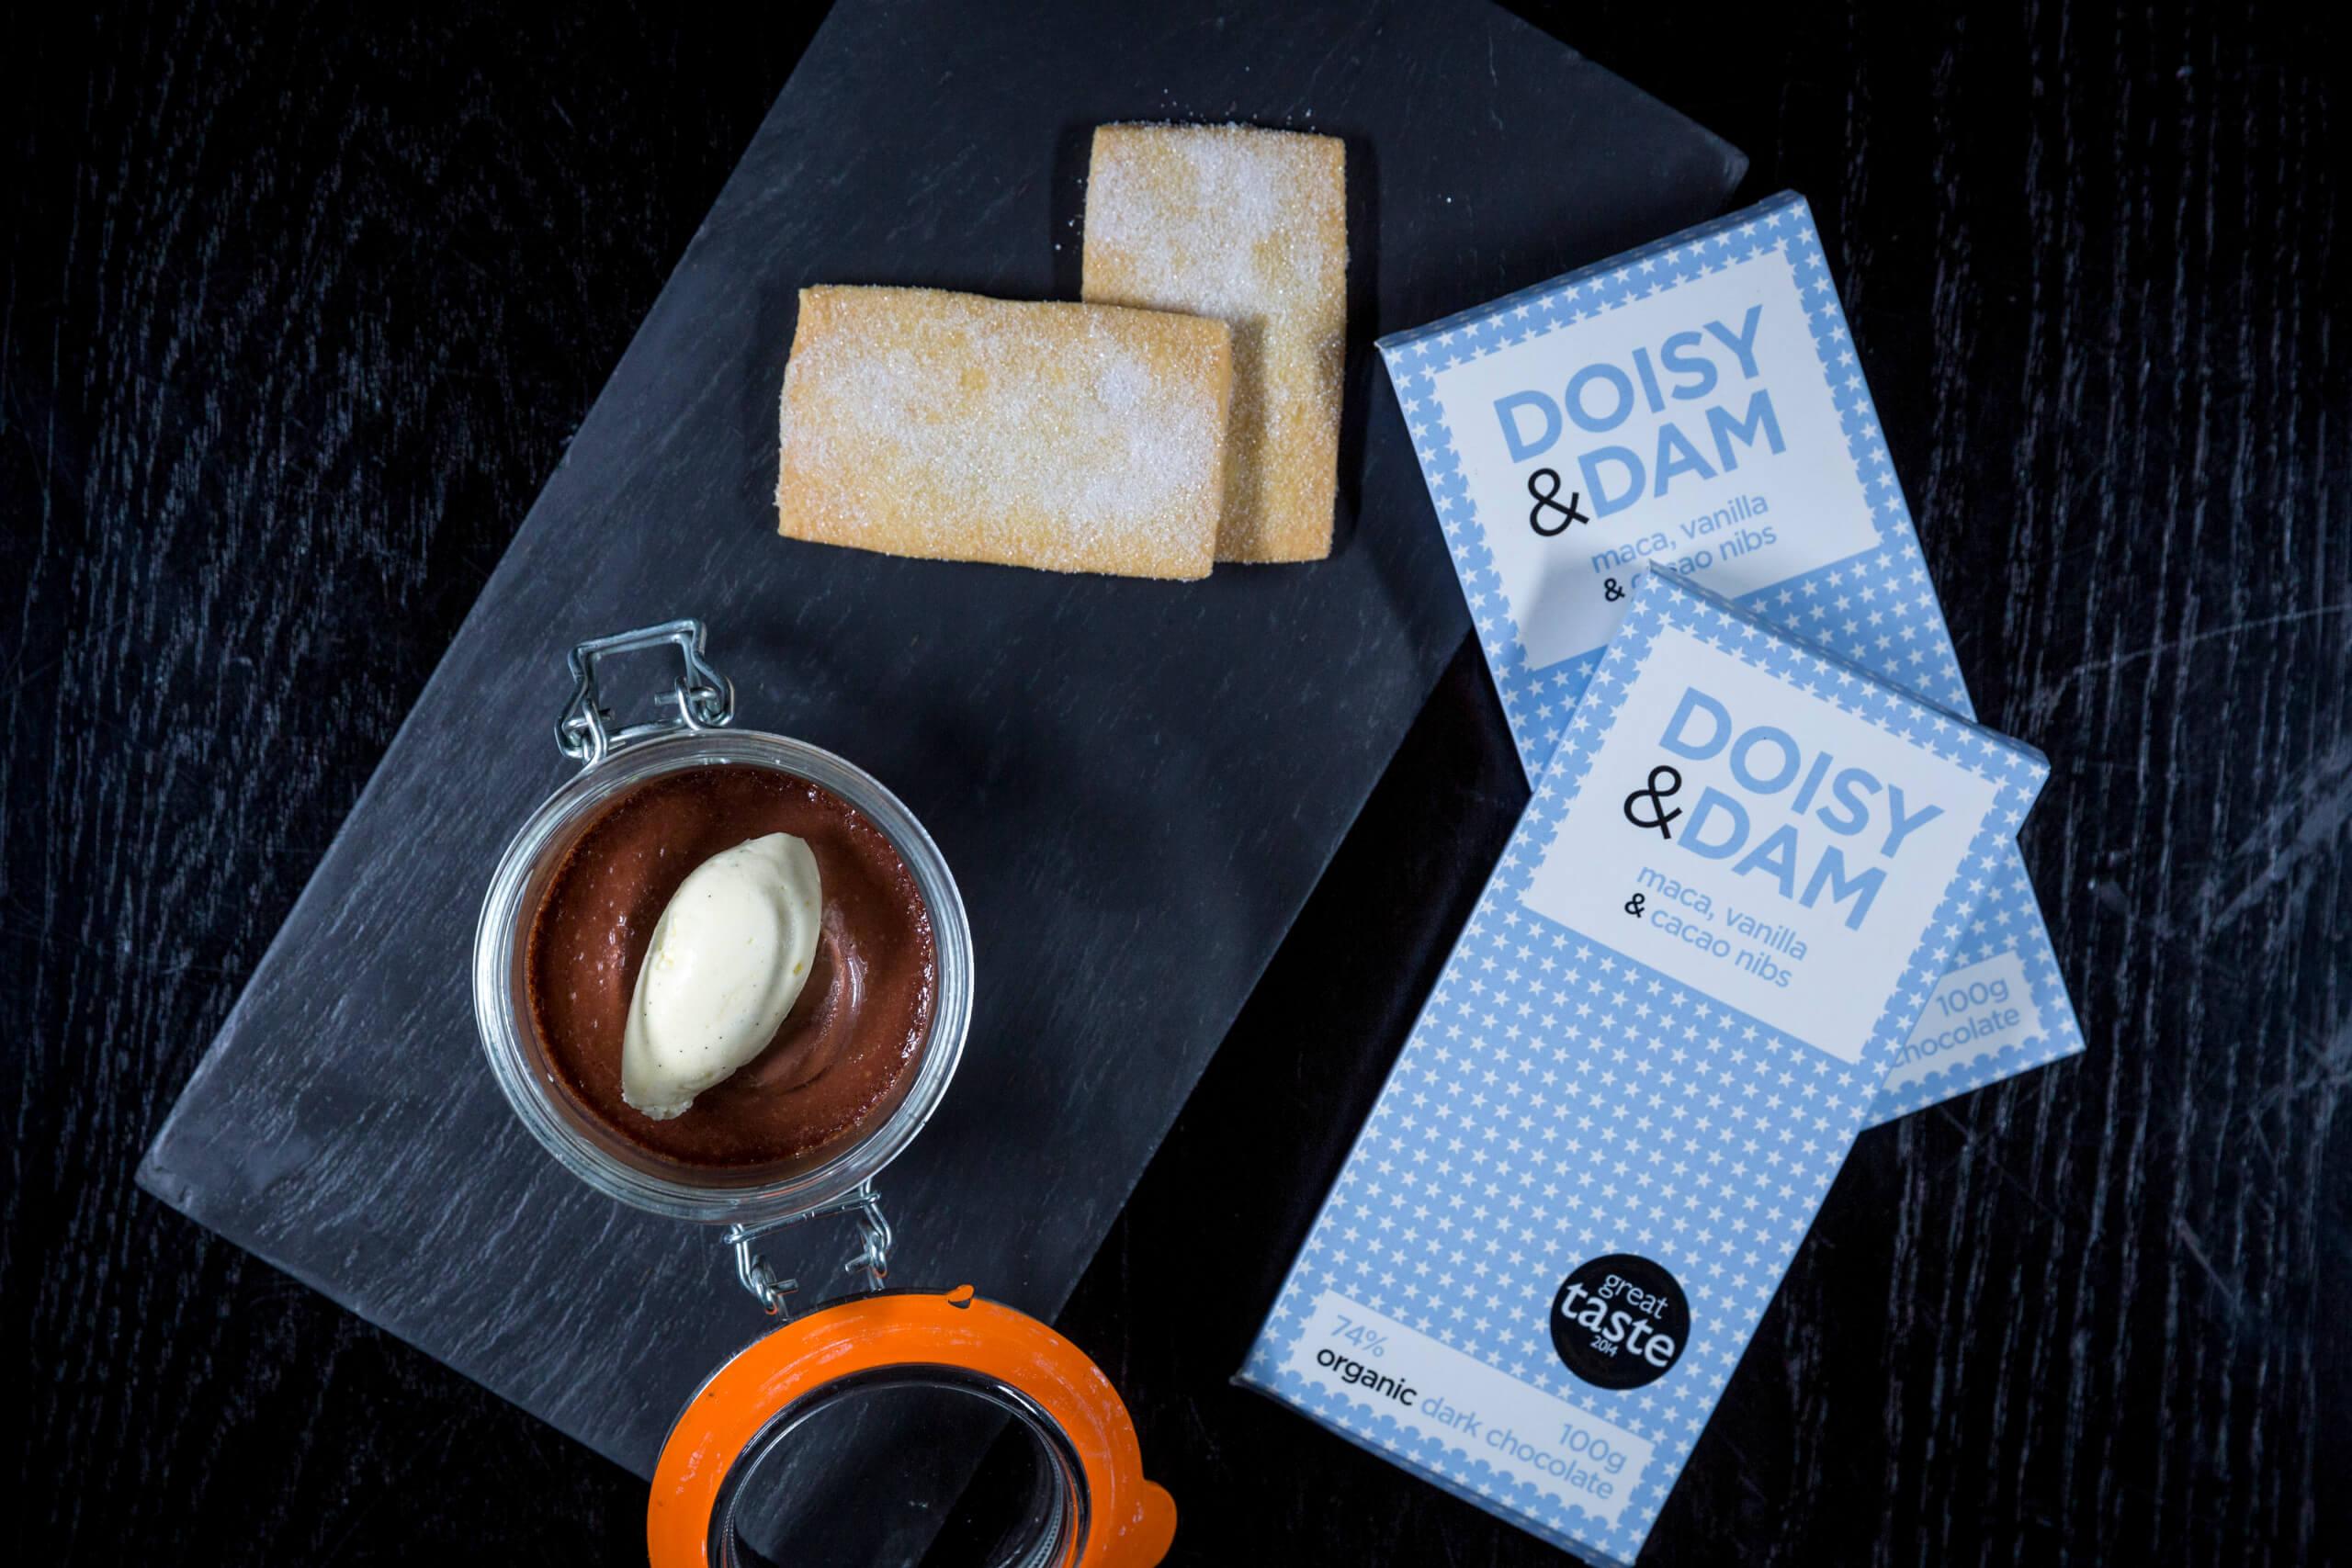 Doisy_&_Dam_Chocolate_Pots